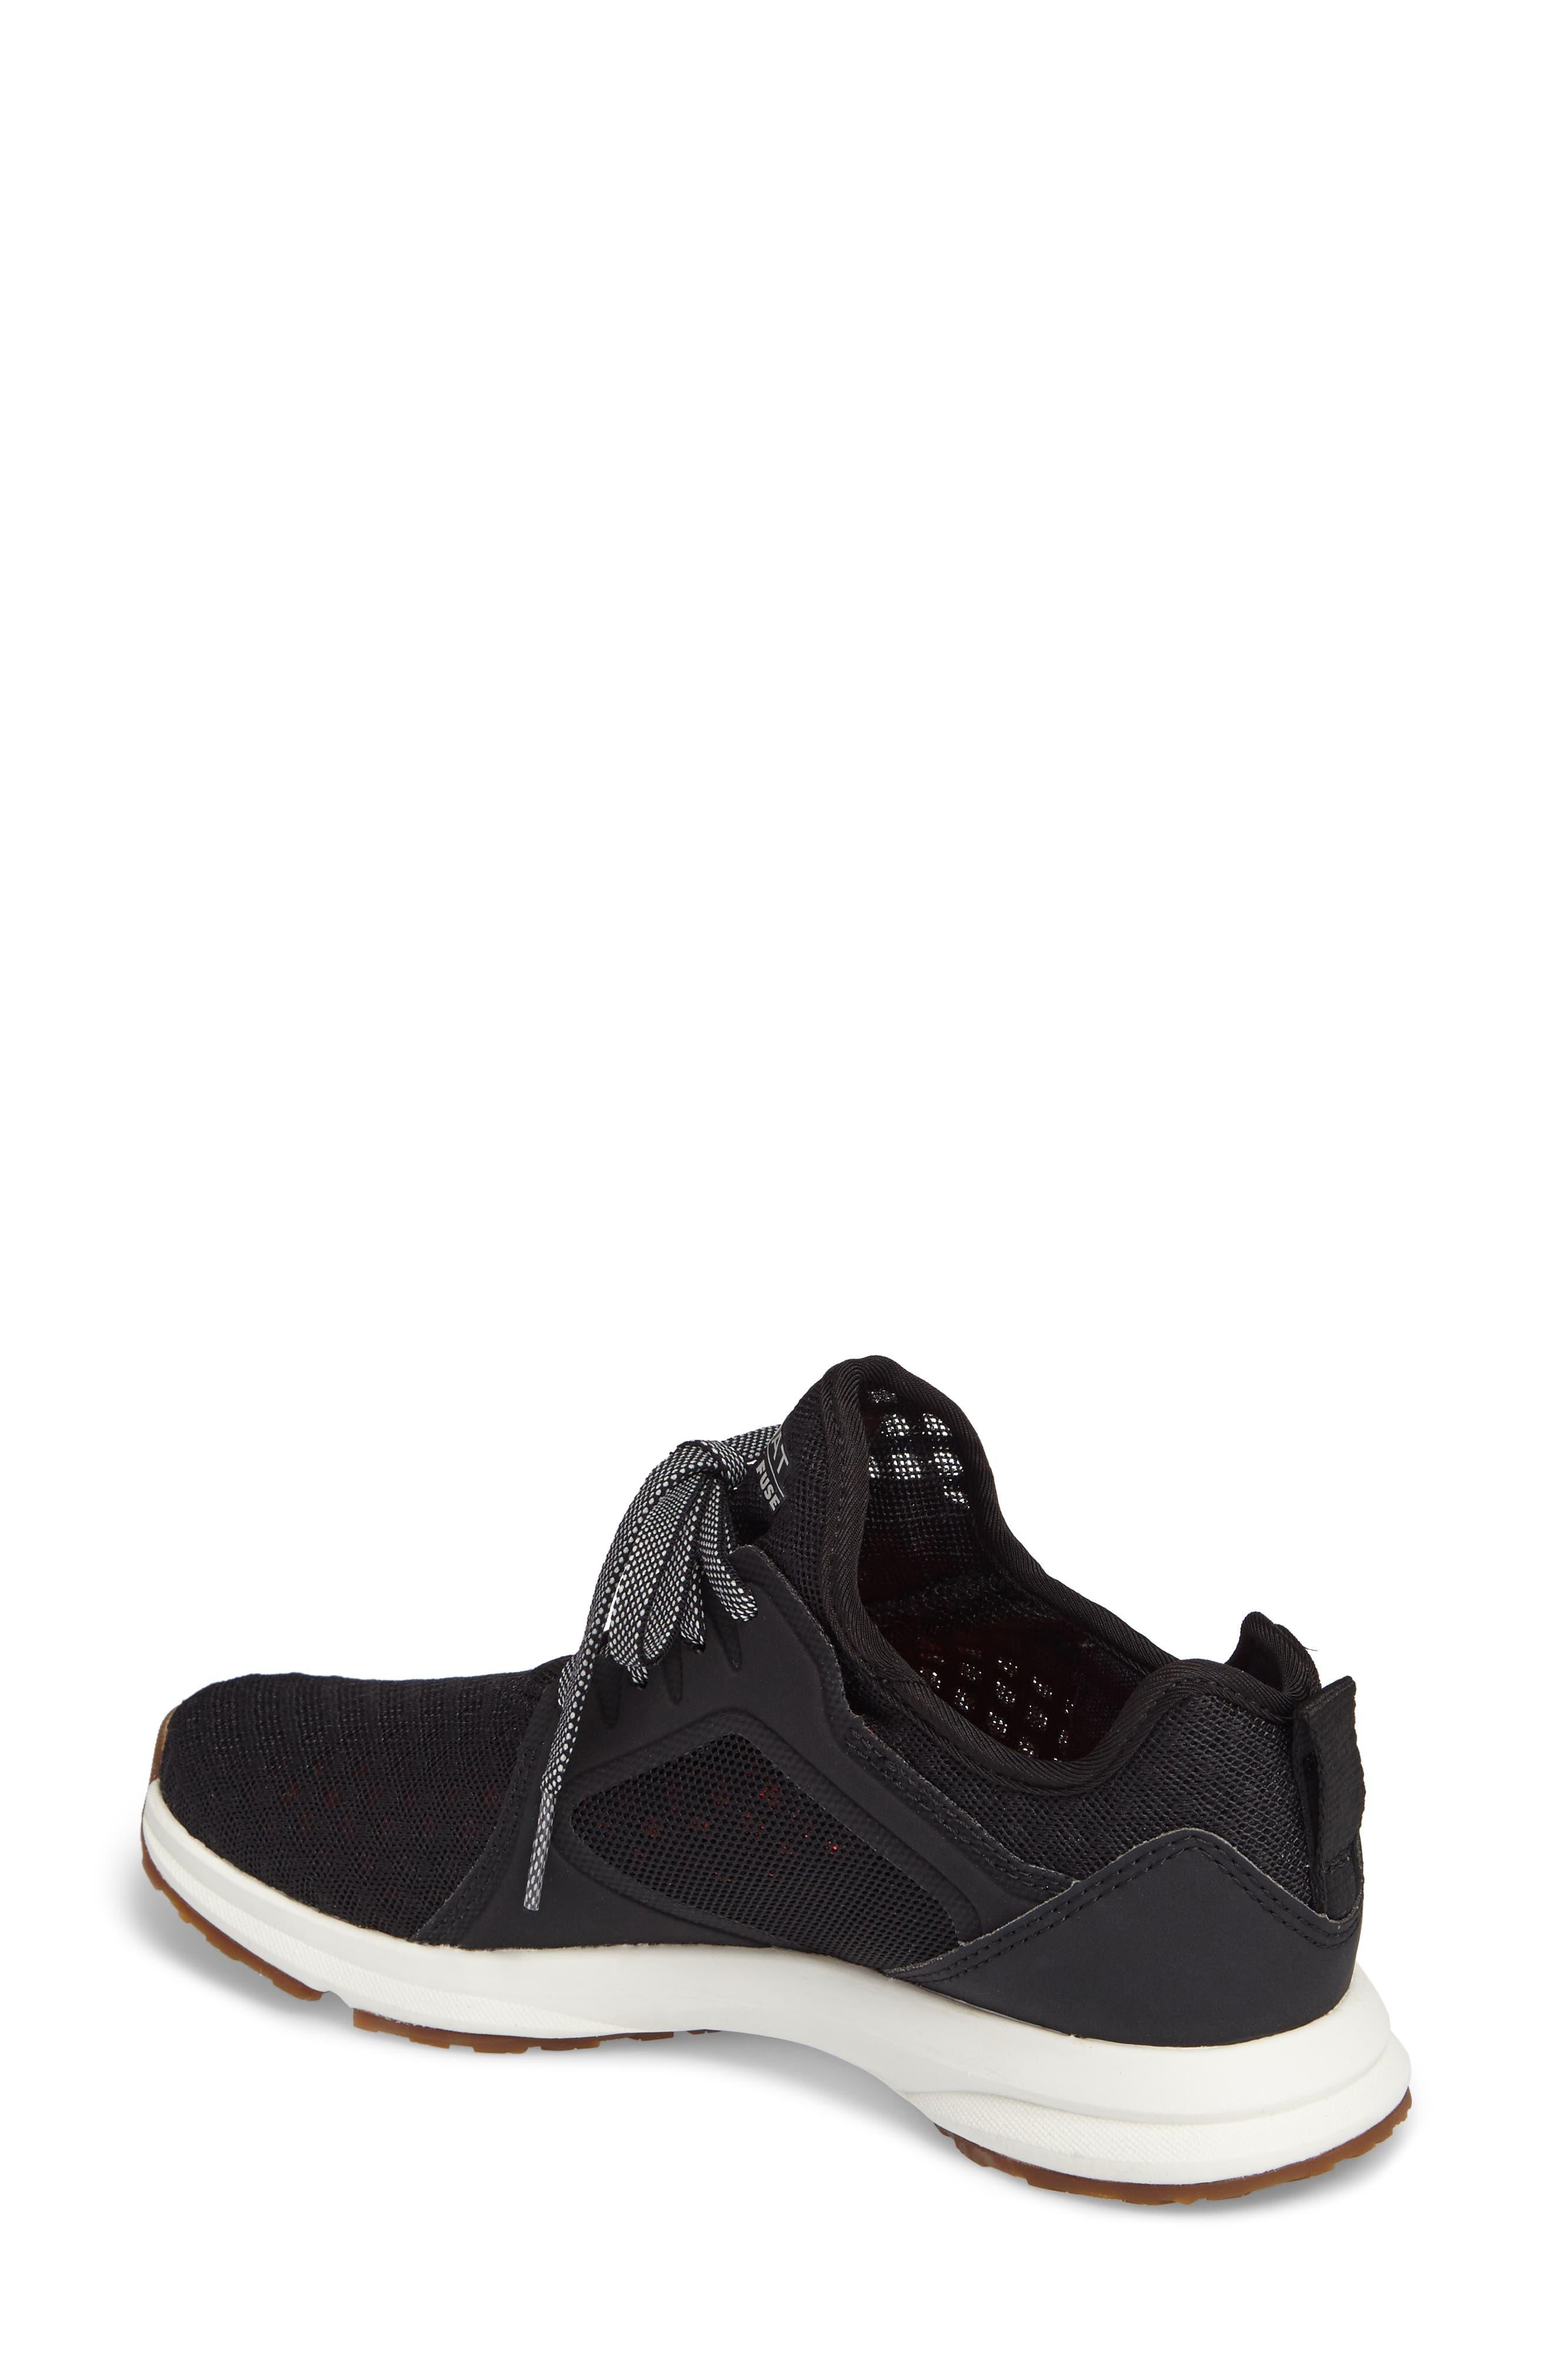 Fuse Sneaker,                             Alternate thumbnail 2, color,                             001